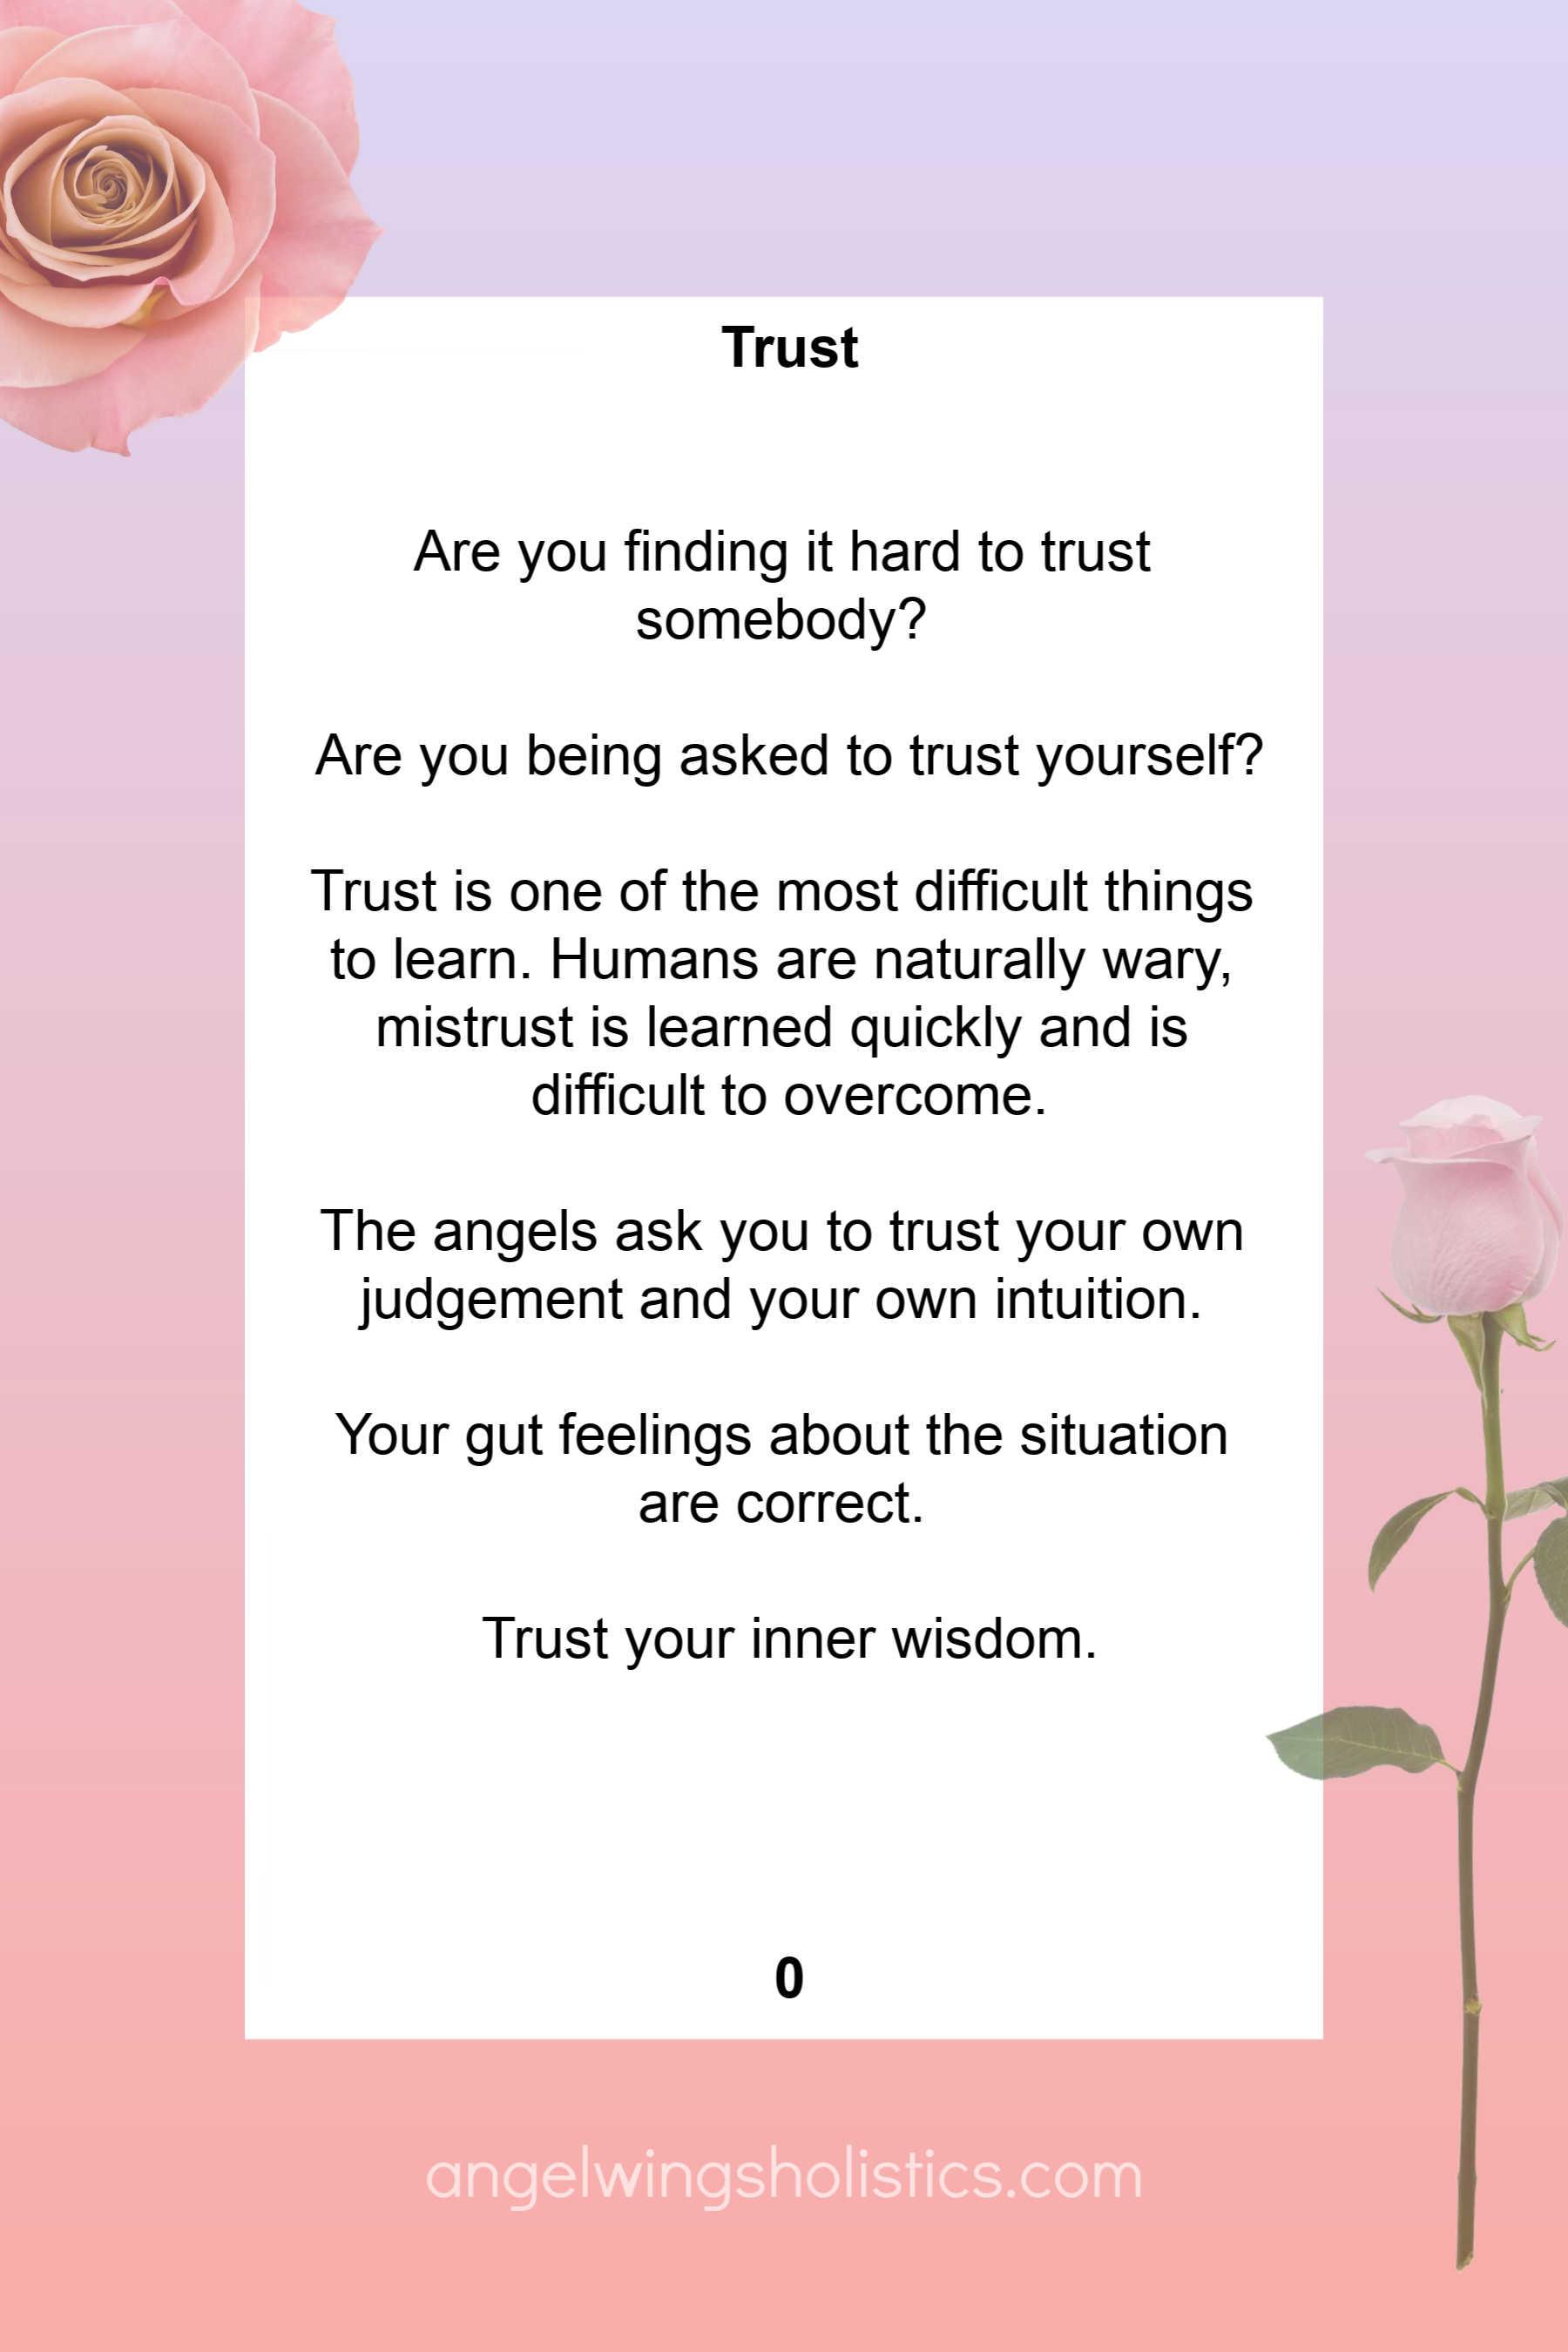 Card Number 0 - Trust